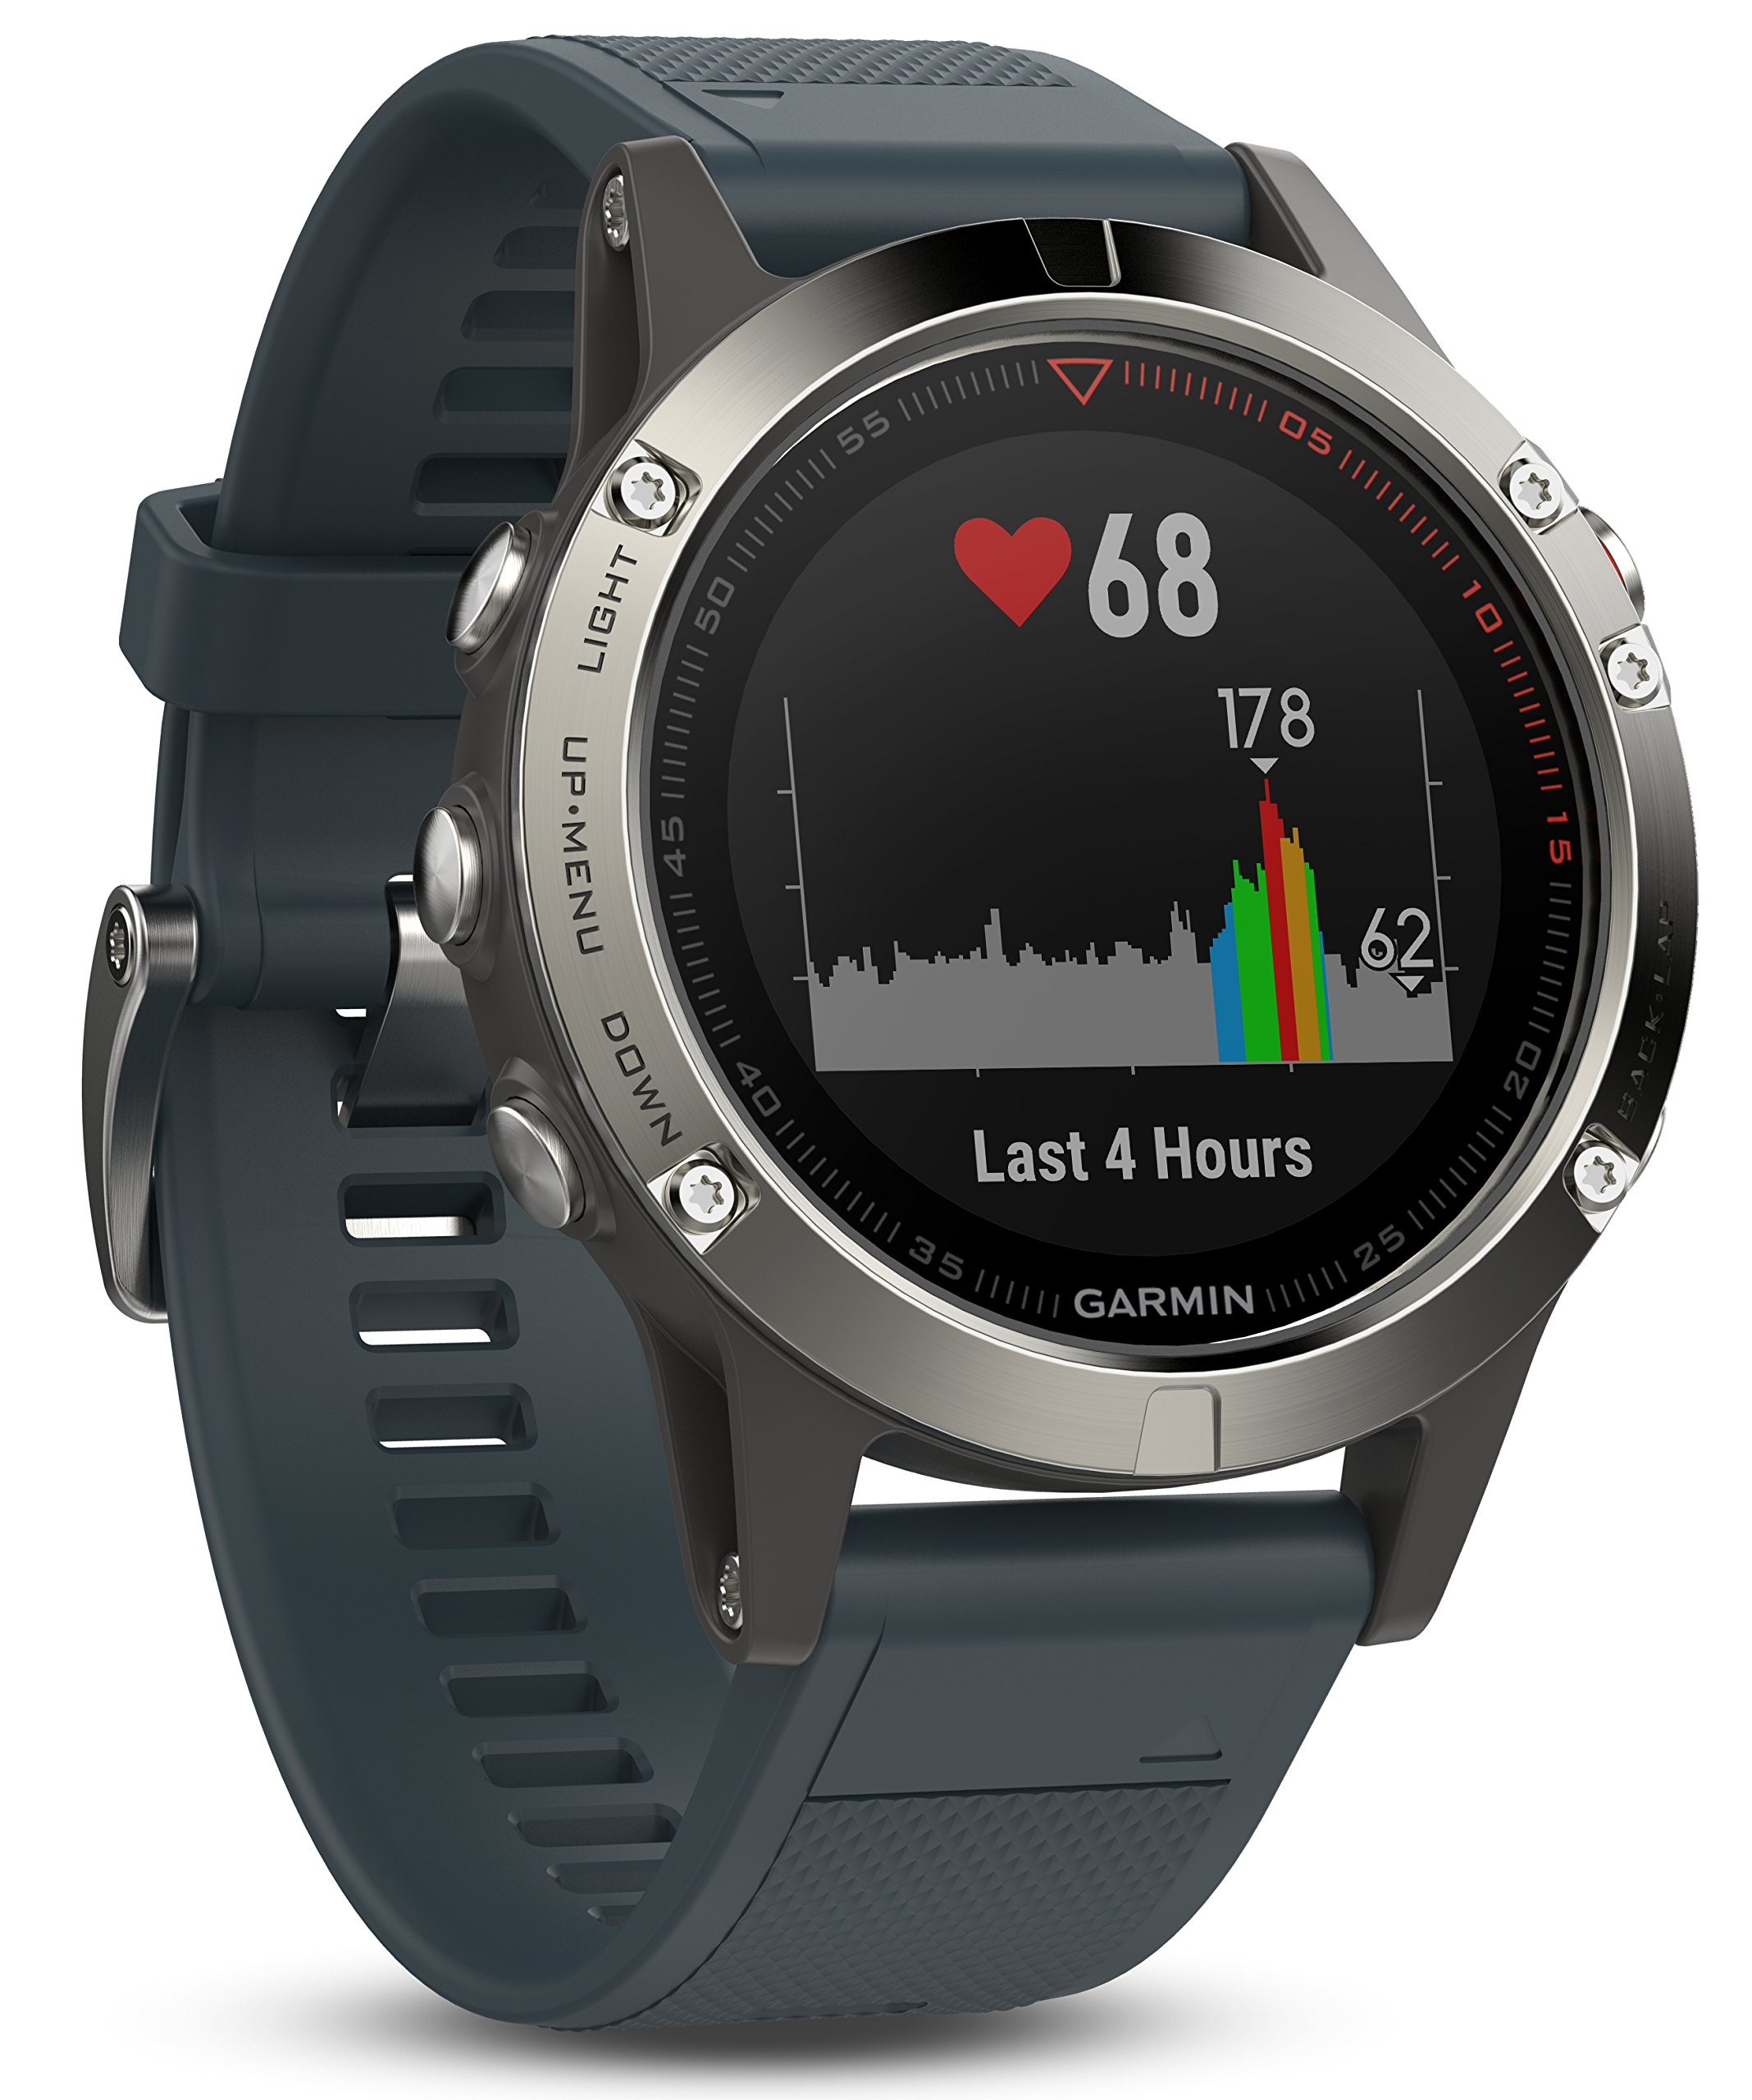 Garmin fēnix 5s, Premium and Rugged Smaller-Sized Multisport GPS Smartwatch, Silver/Turquoise